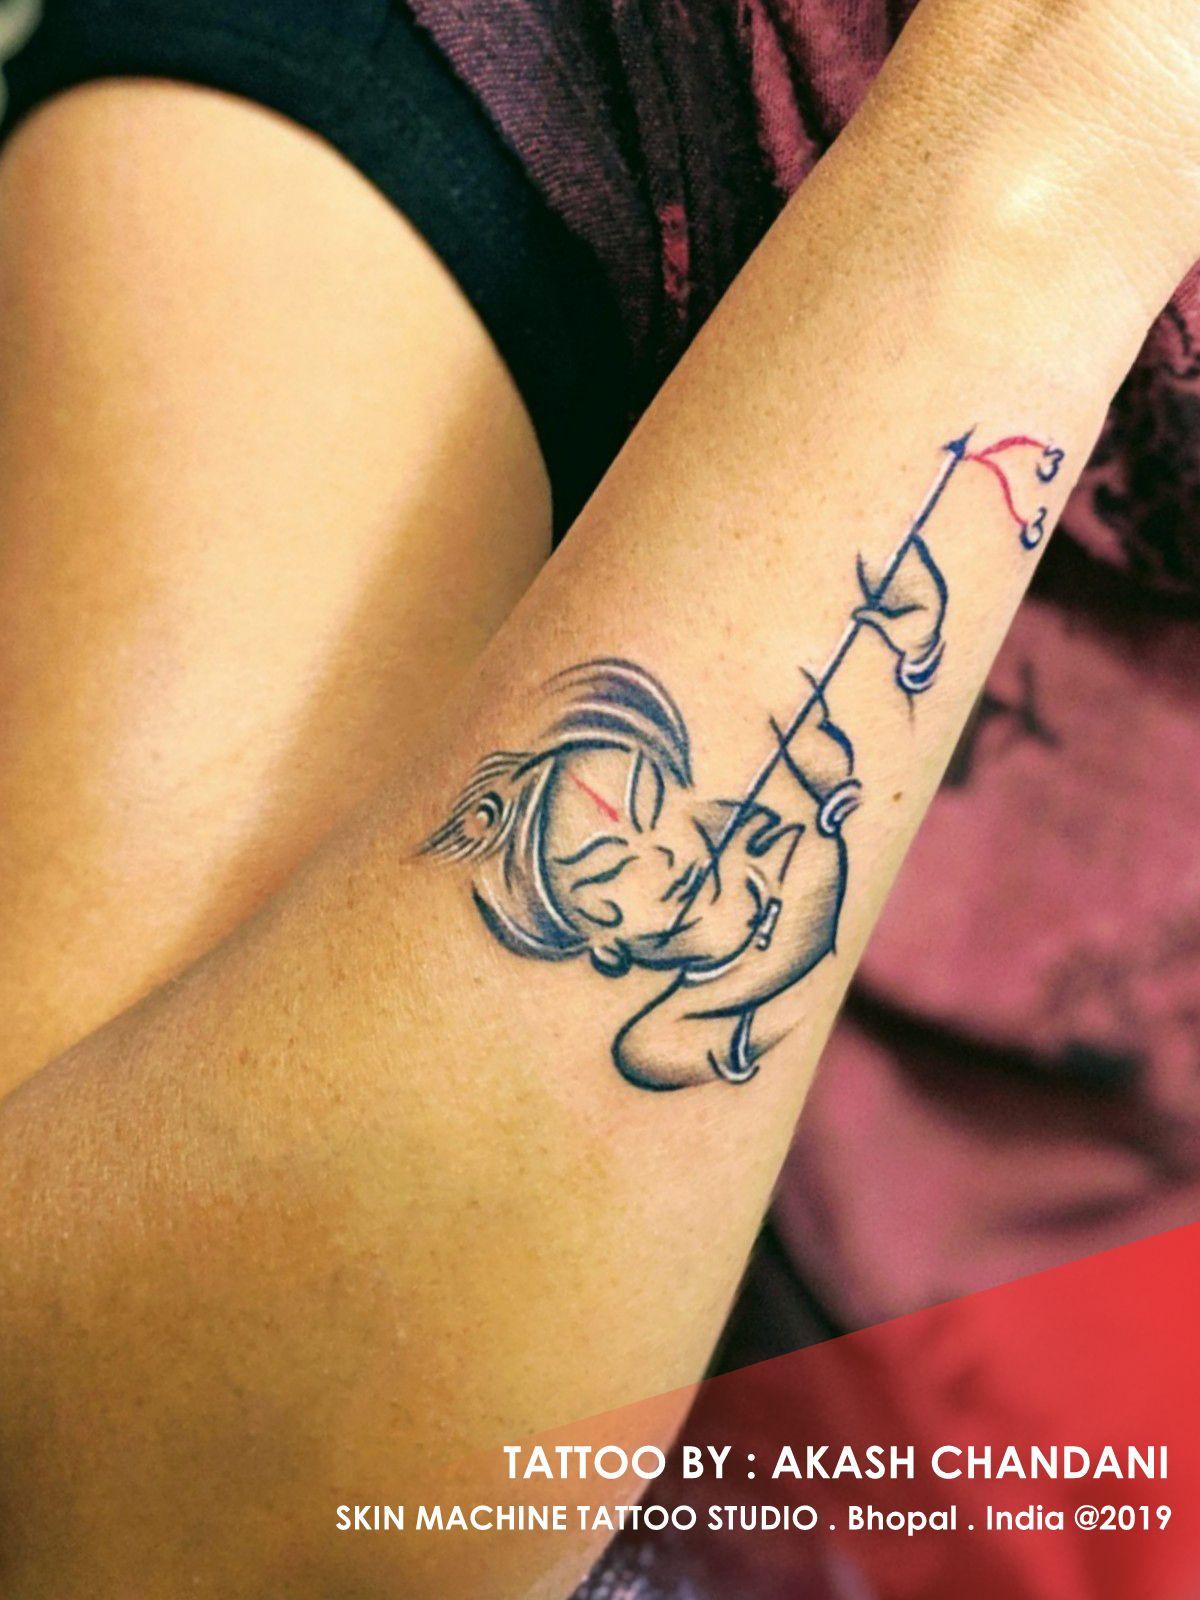 Lord Krishna Tattoo By Akash Chandani Skin Machine Tattoo Studio Skinmachinetattoo Email For Appointments Skin Krishna Tattoo Hindu Tattoos Tattoo Designs